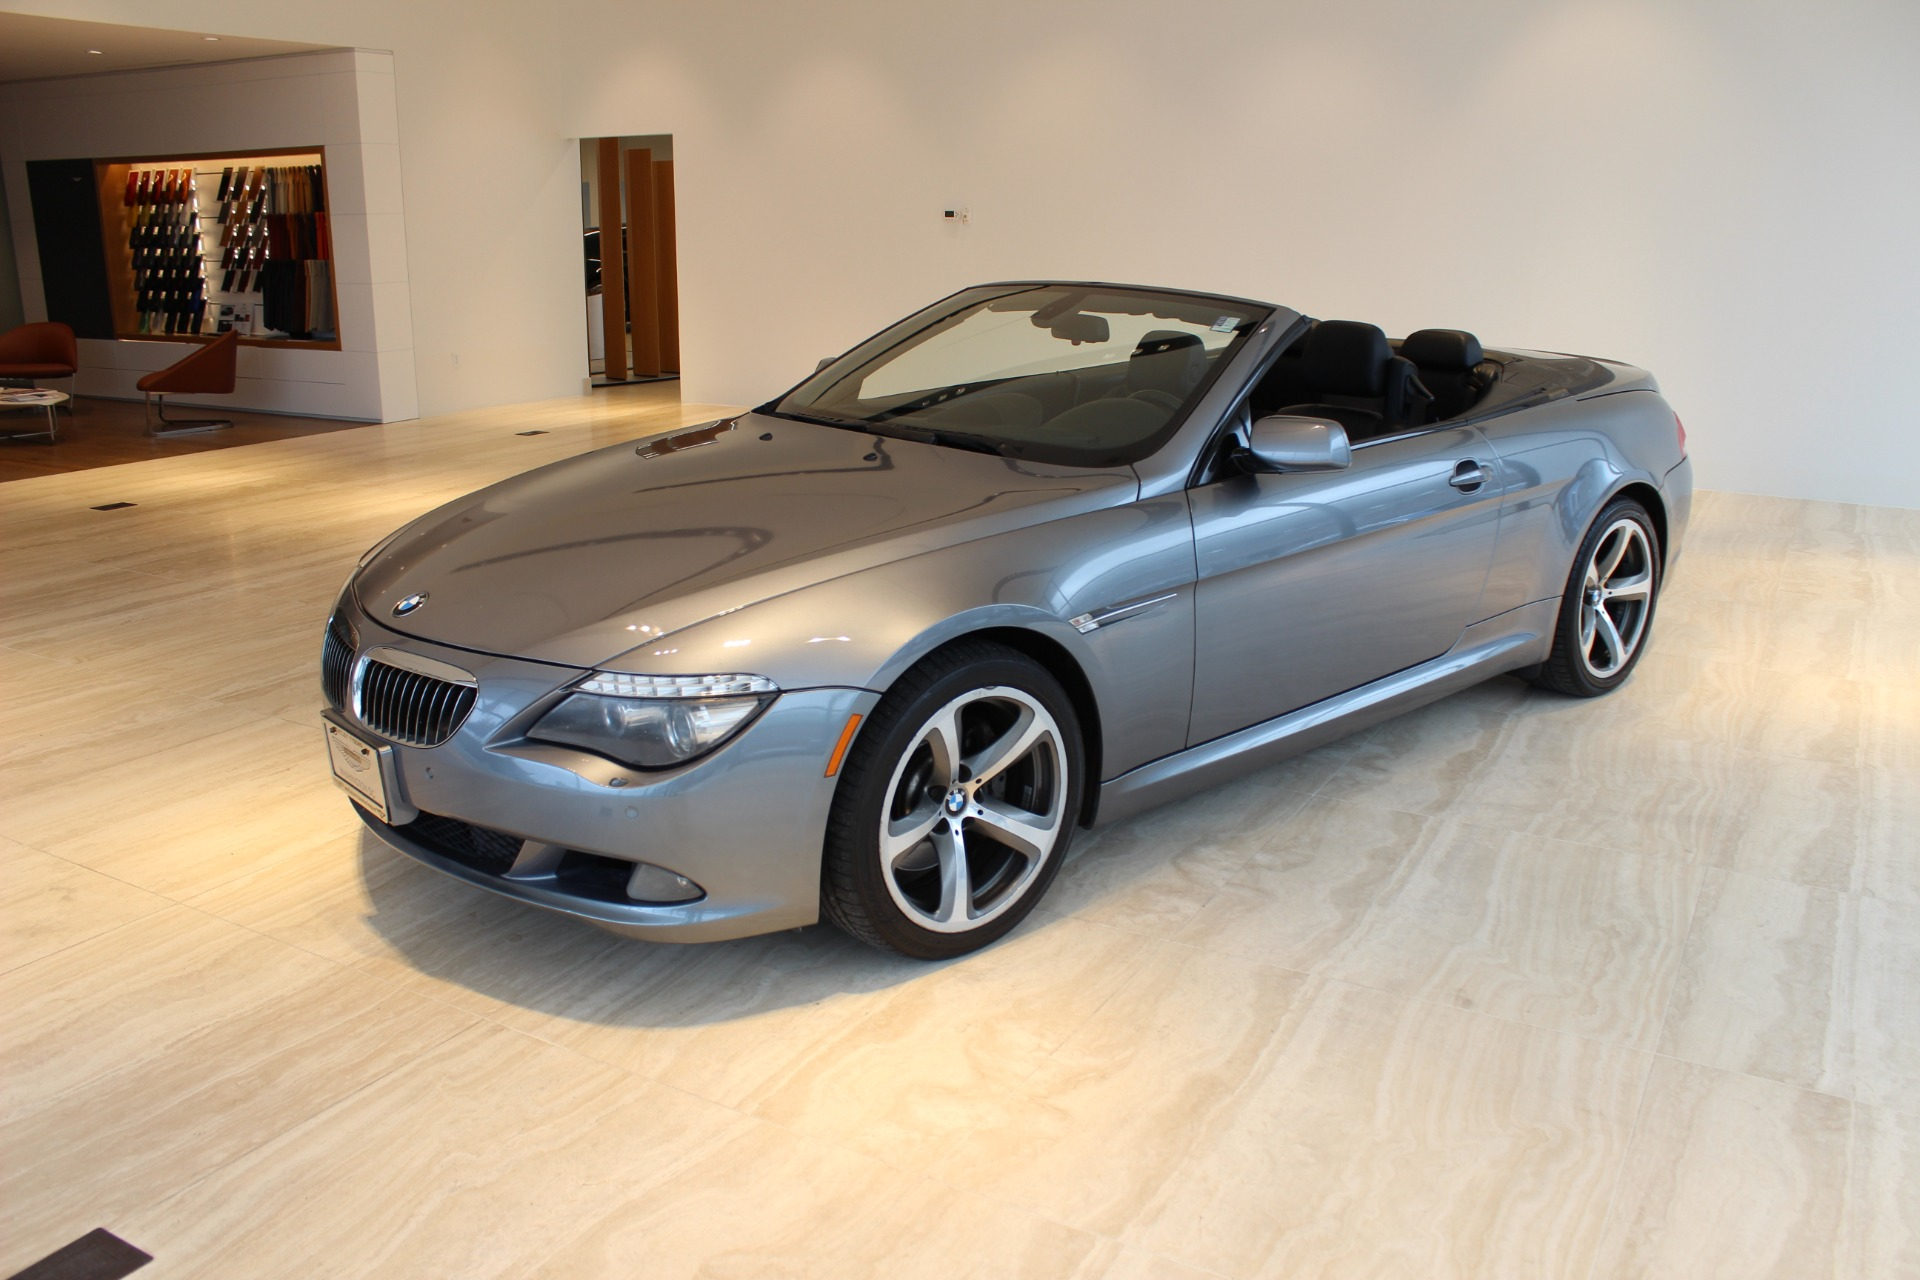 2008 BMW 6 Series 650i Stock # P092352C for sale near Vienna, VA ...